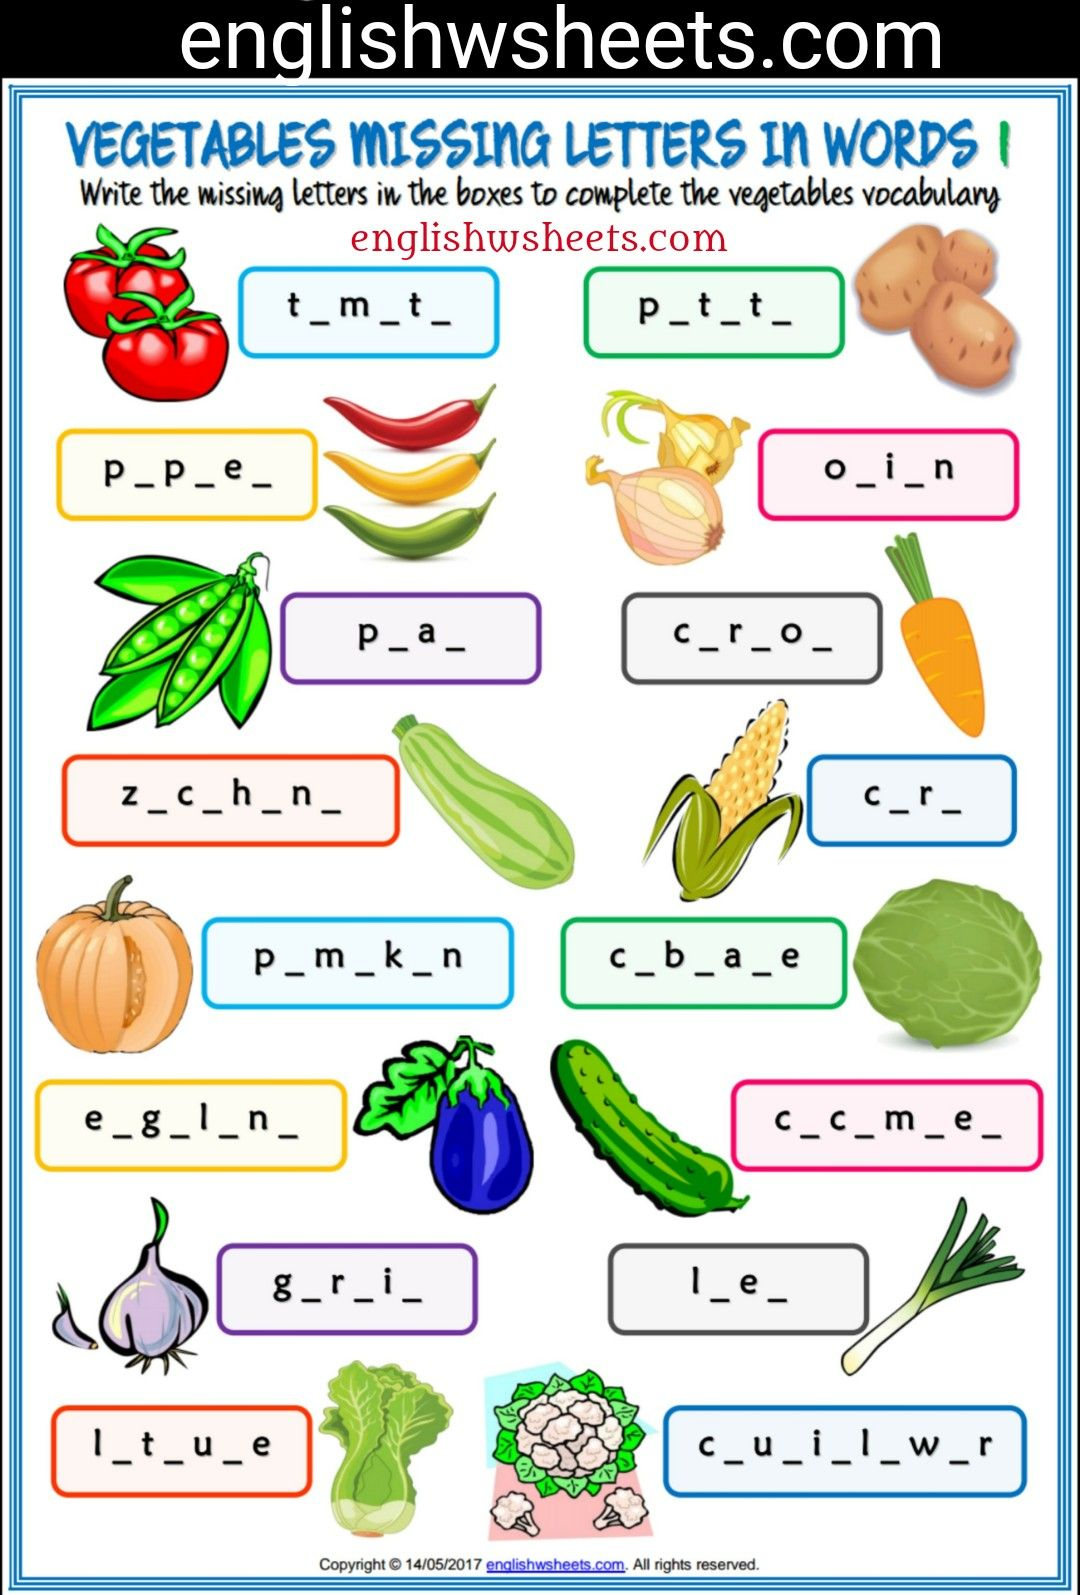 Vegetables Esl Printable Missing Letters In Words Worksheets For Kids Vegetables Esl Worksheets For Kids English Lessons For Kids Learning English For Kids [ 1595 x 1080 Pixel ]